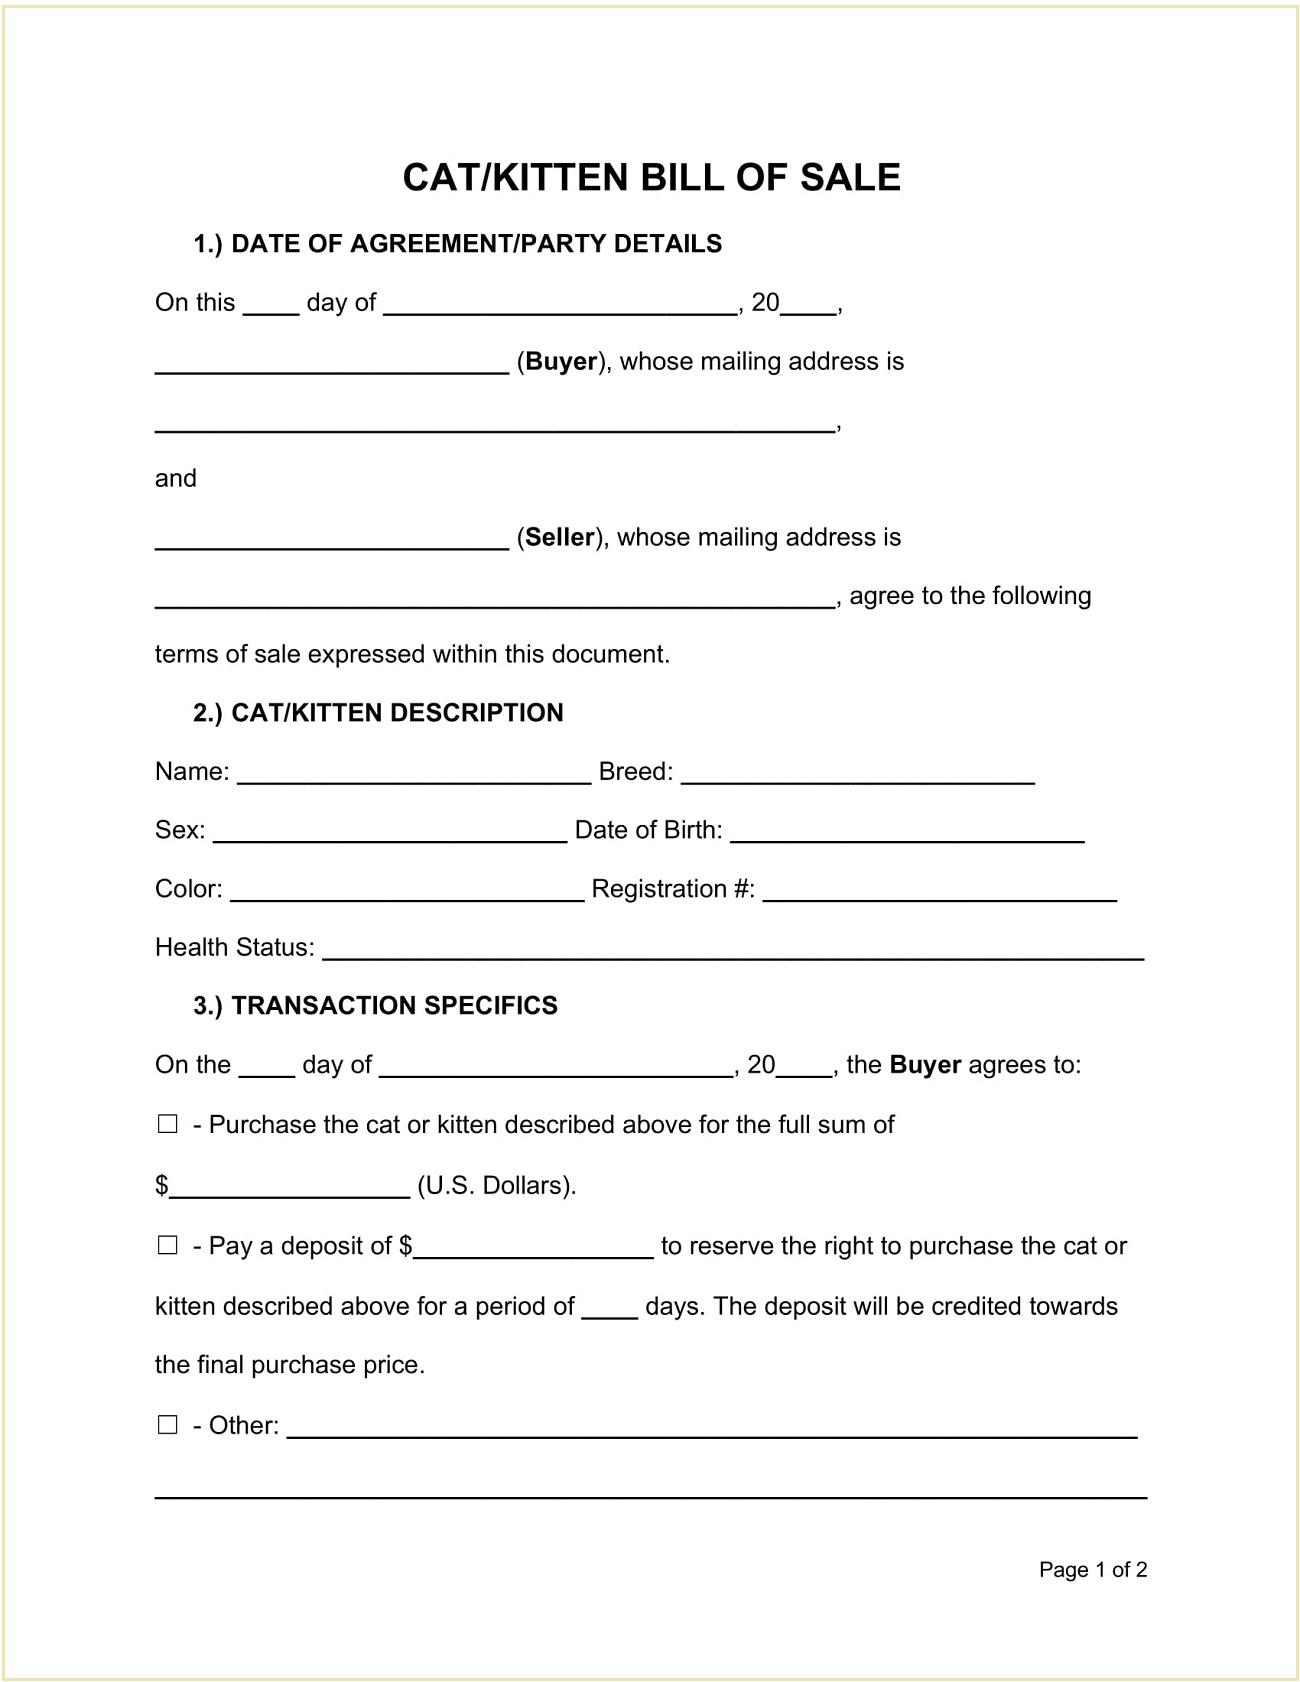 Cat Kitten Bill of Sale Form Template PDF